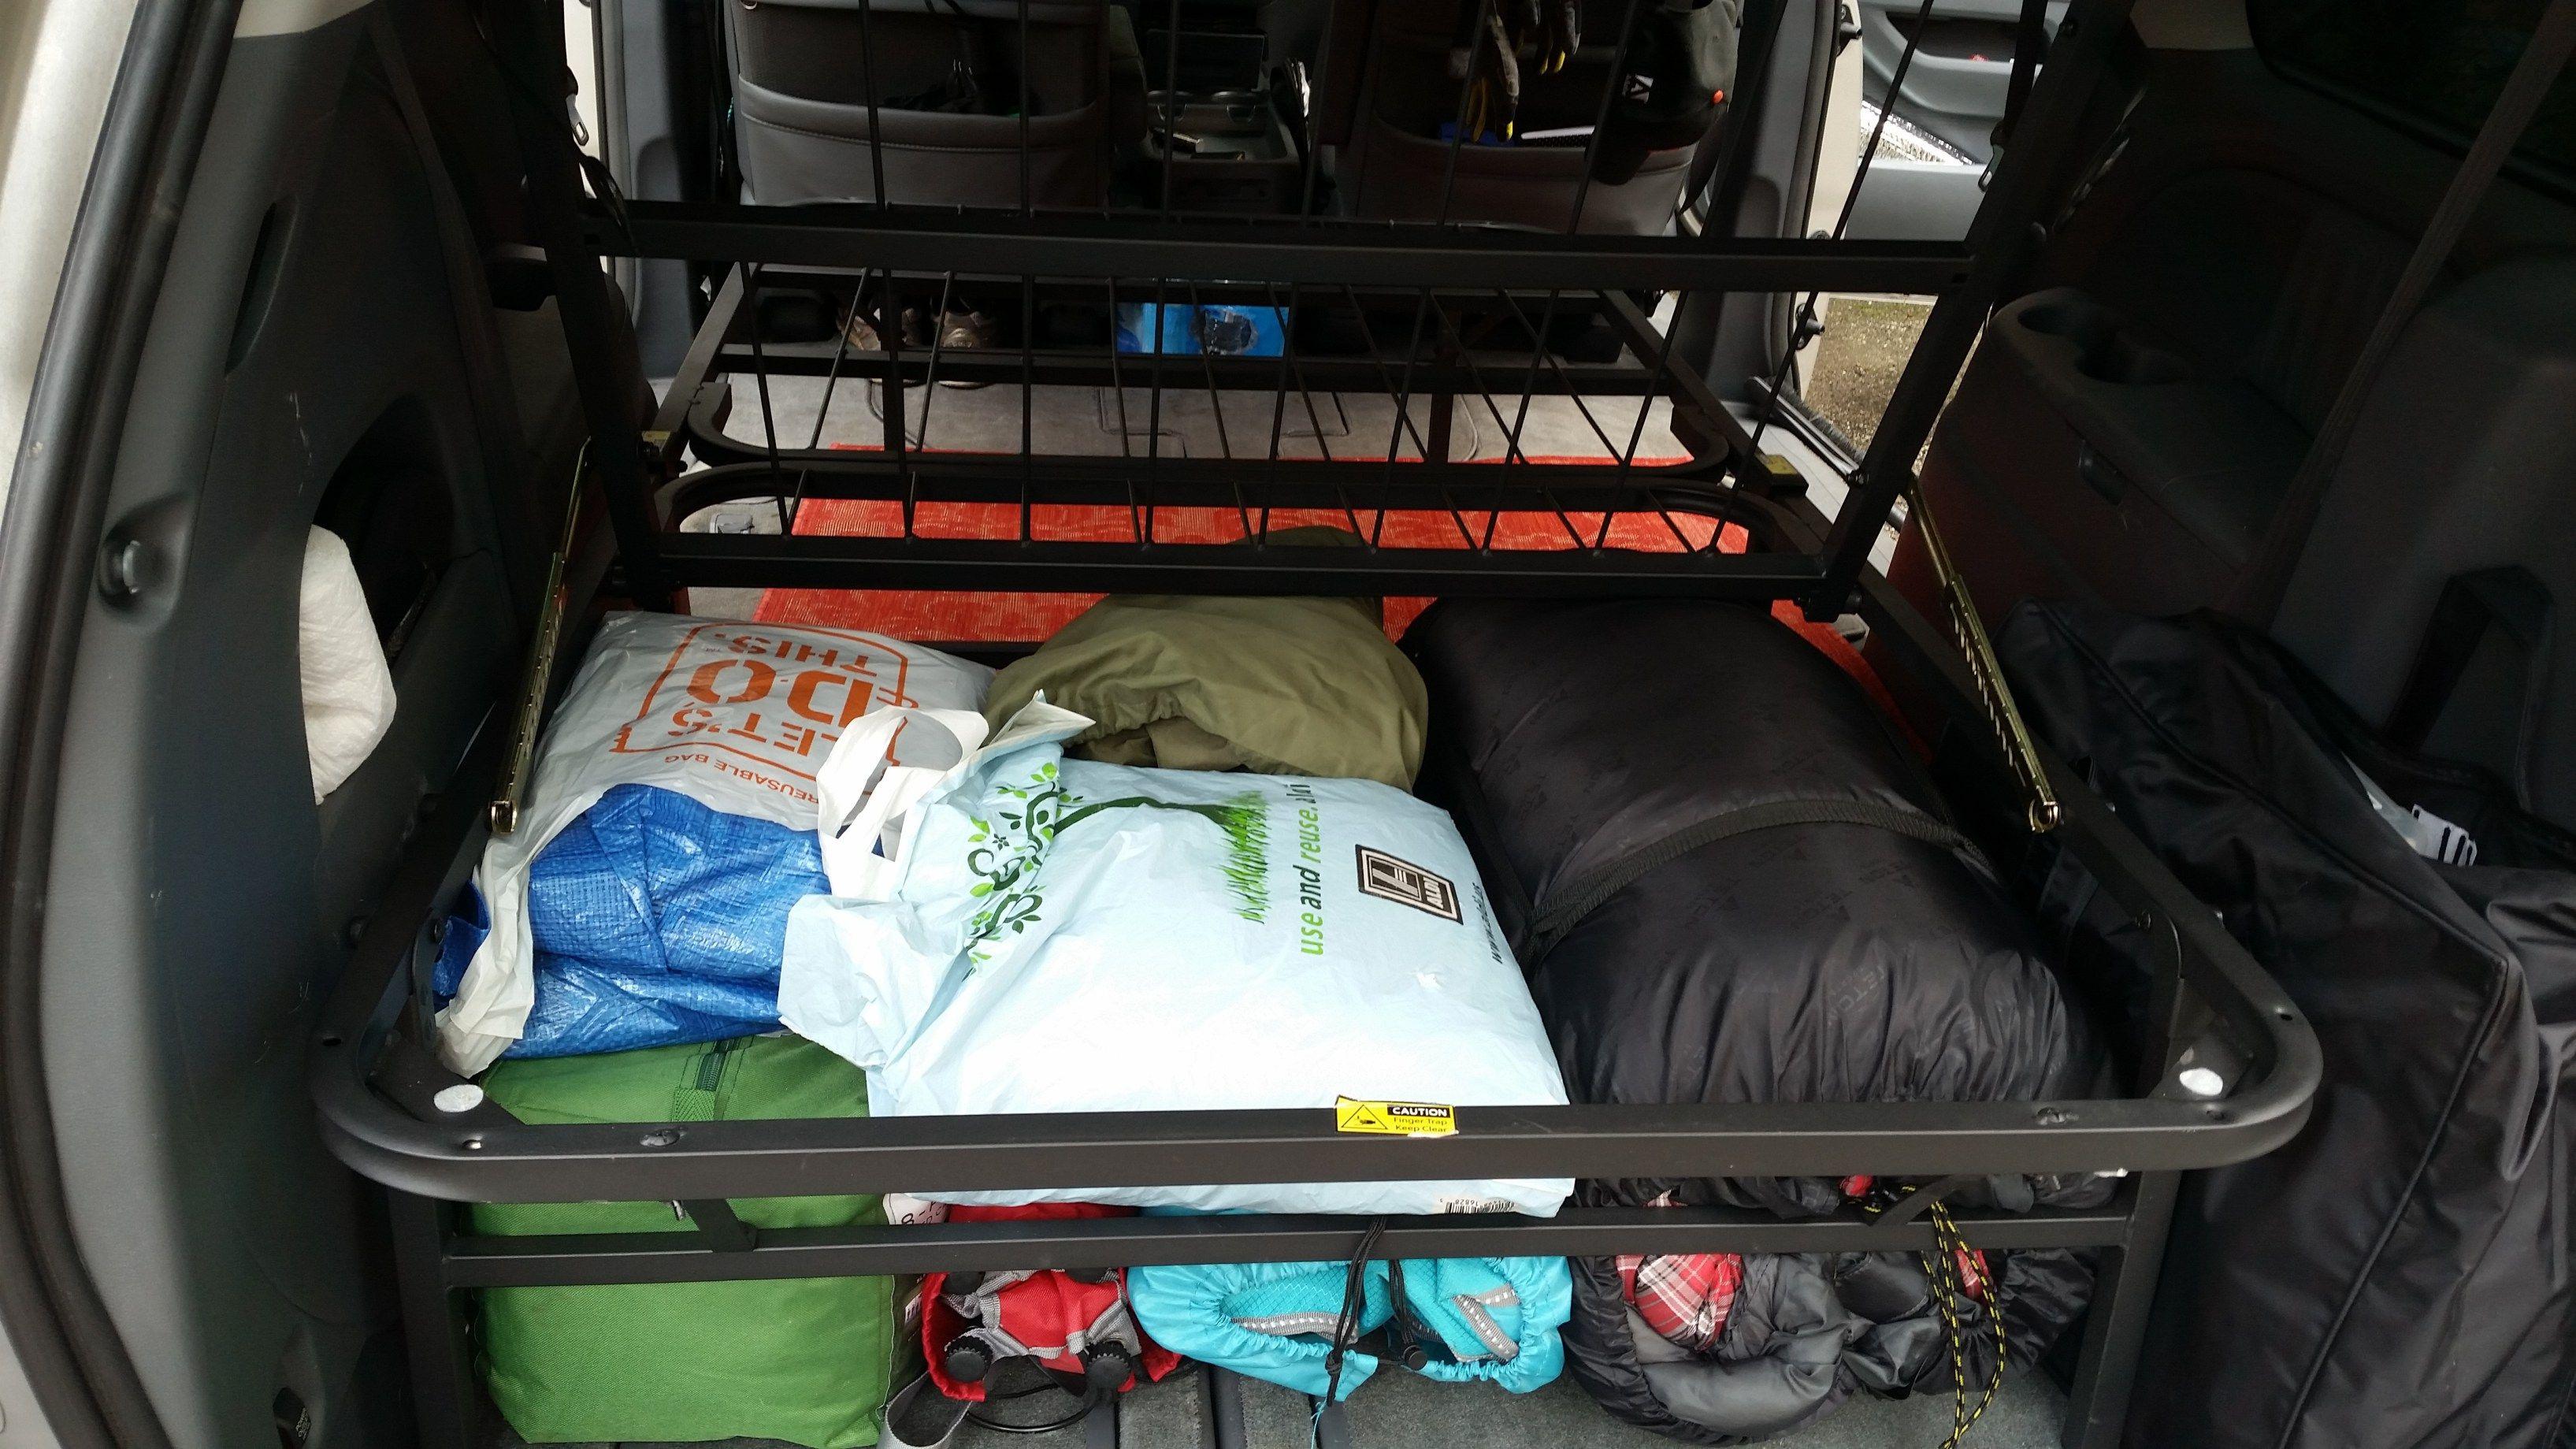 All the camping gear under the bed Mini van, Minivan